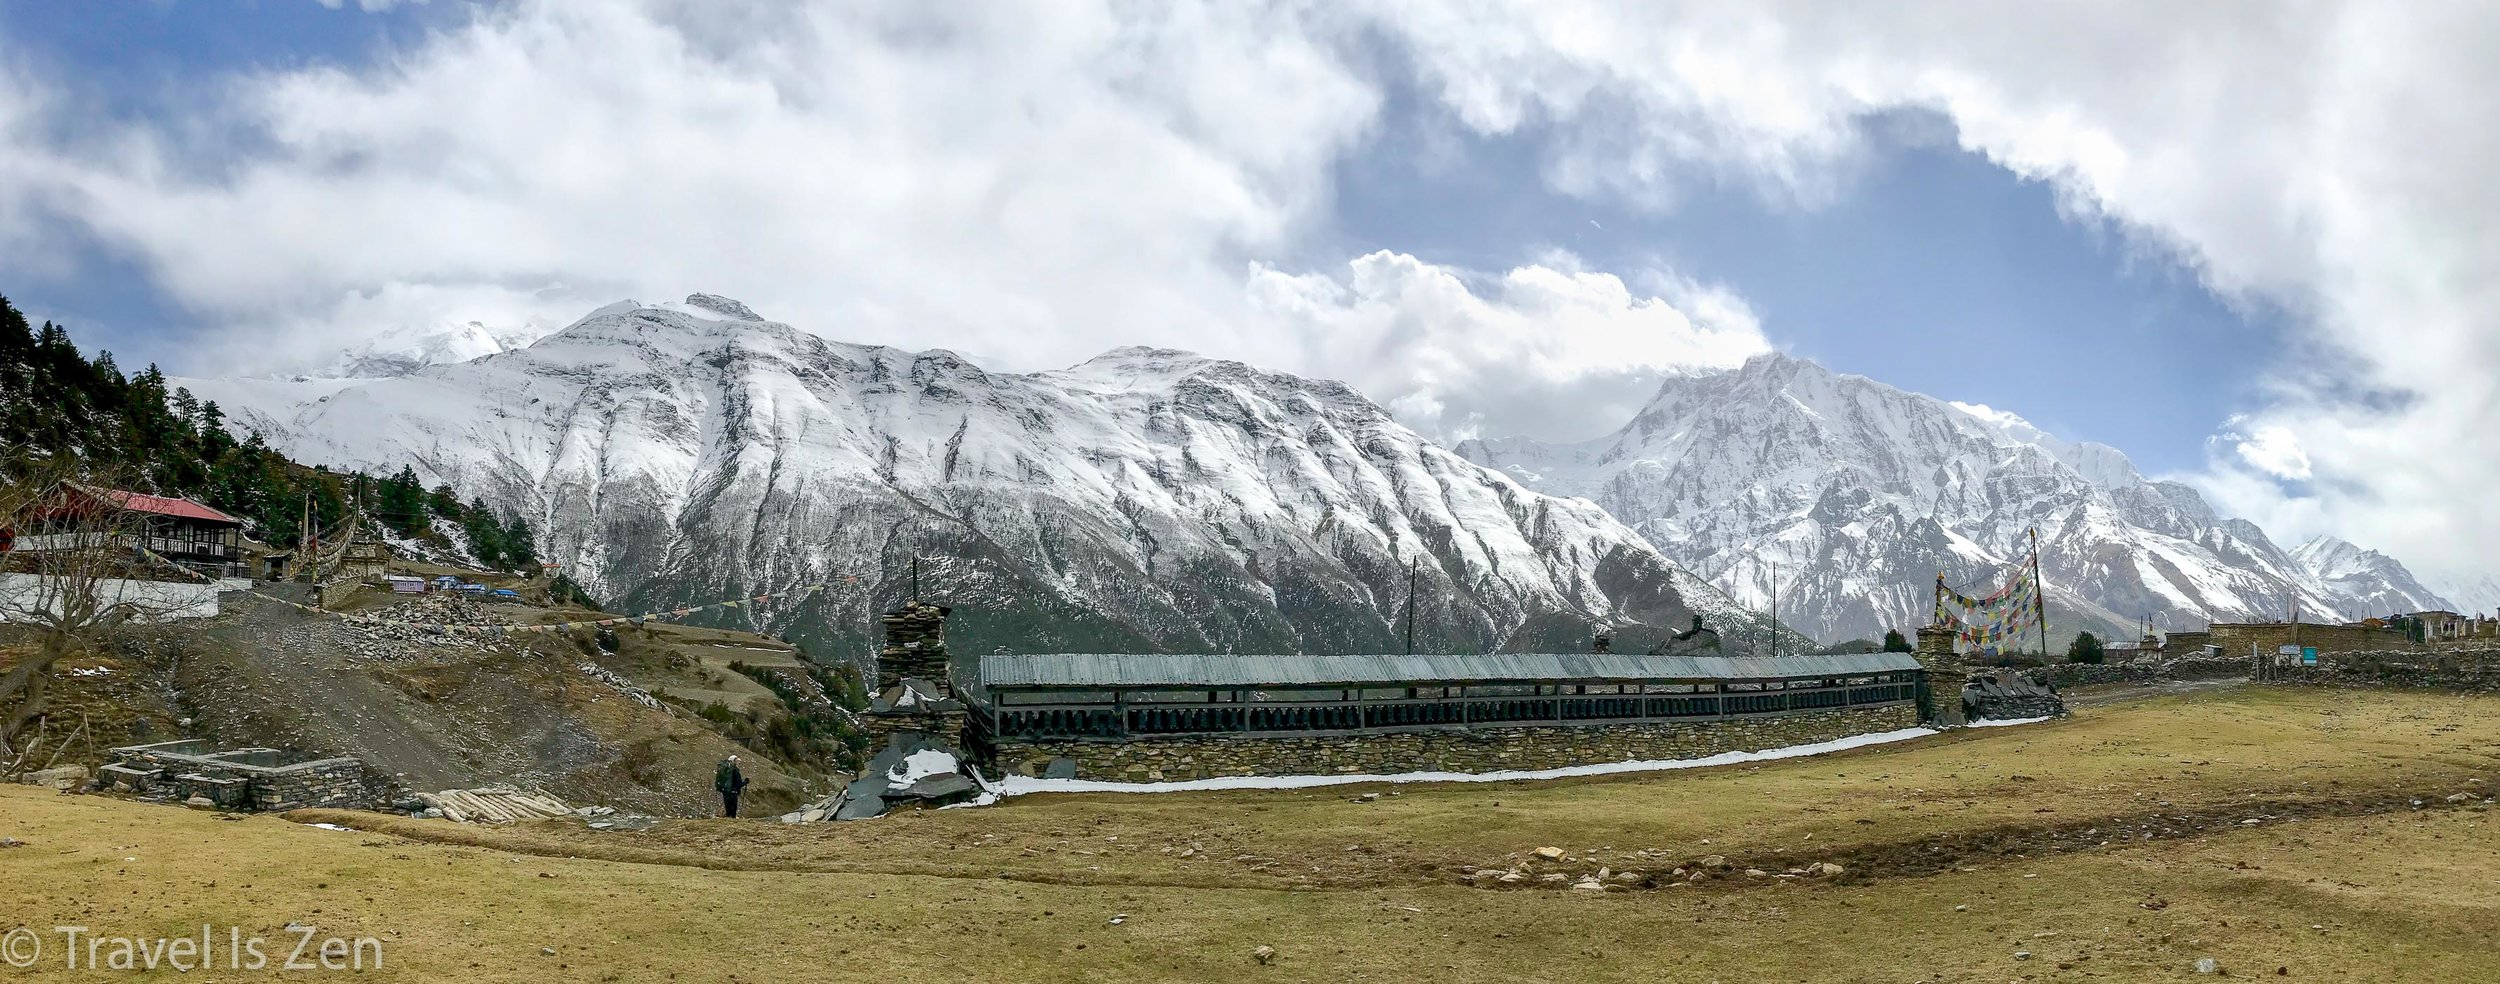 Annapurna Circuit-2-2.jpg